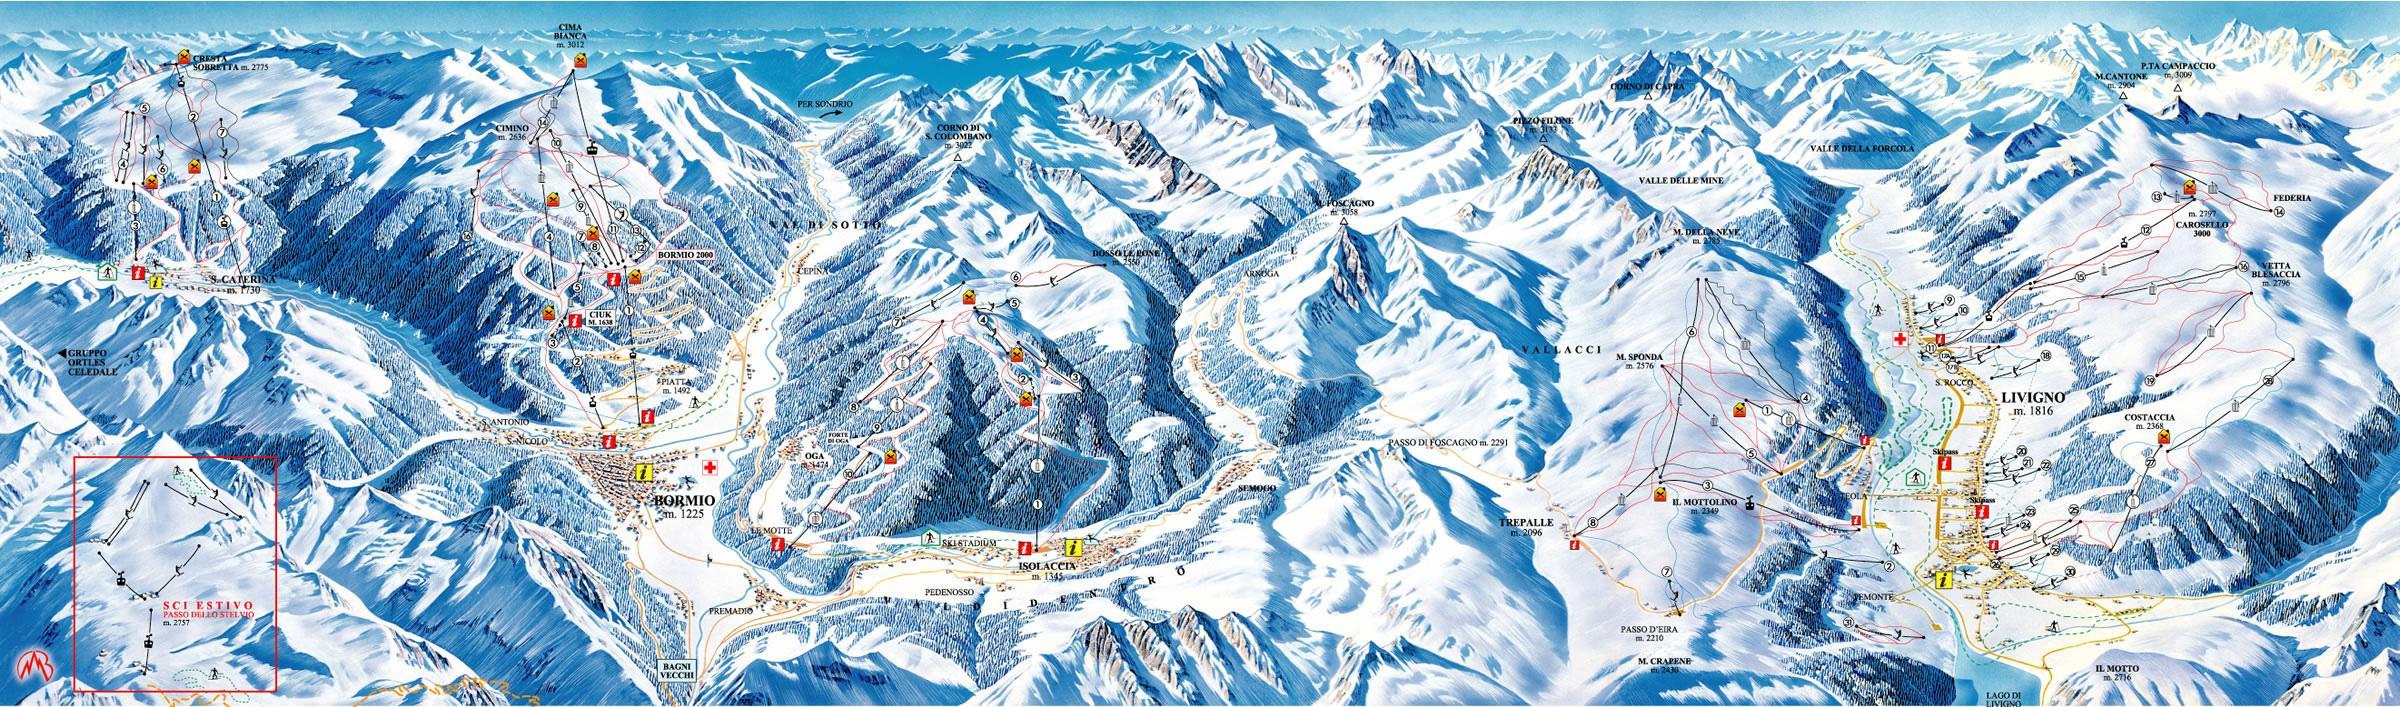 Alta-Valtellina-Piste-Map-Large